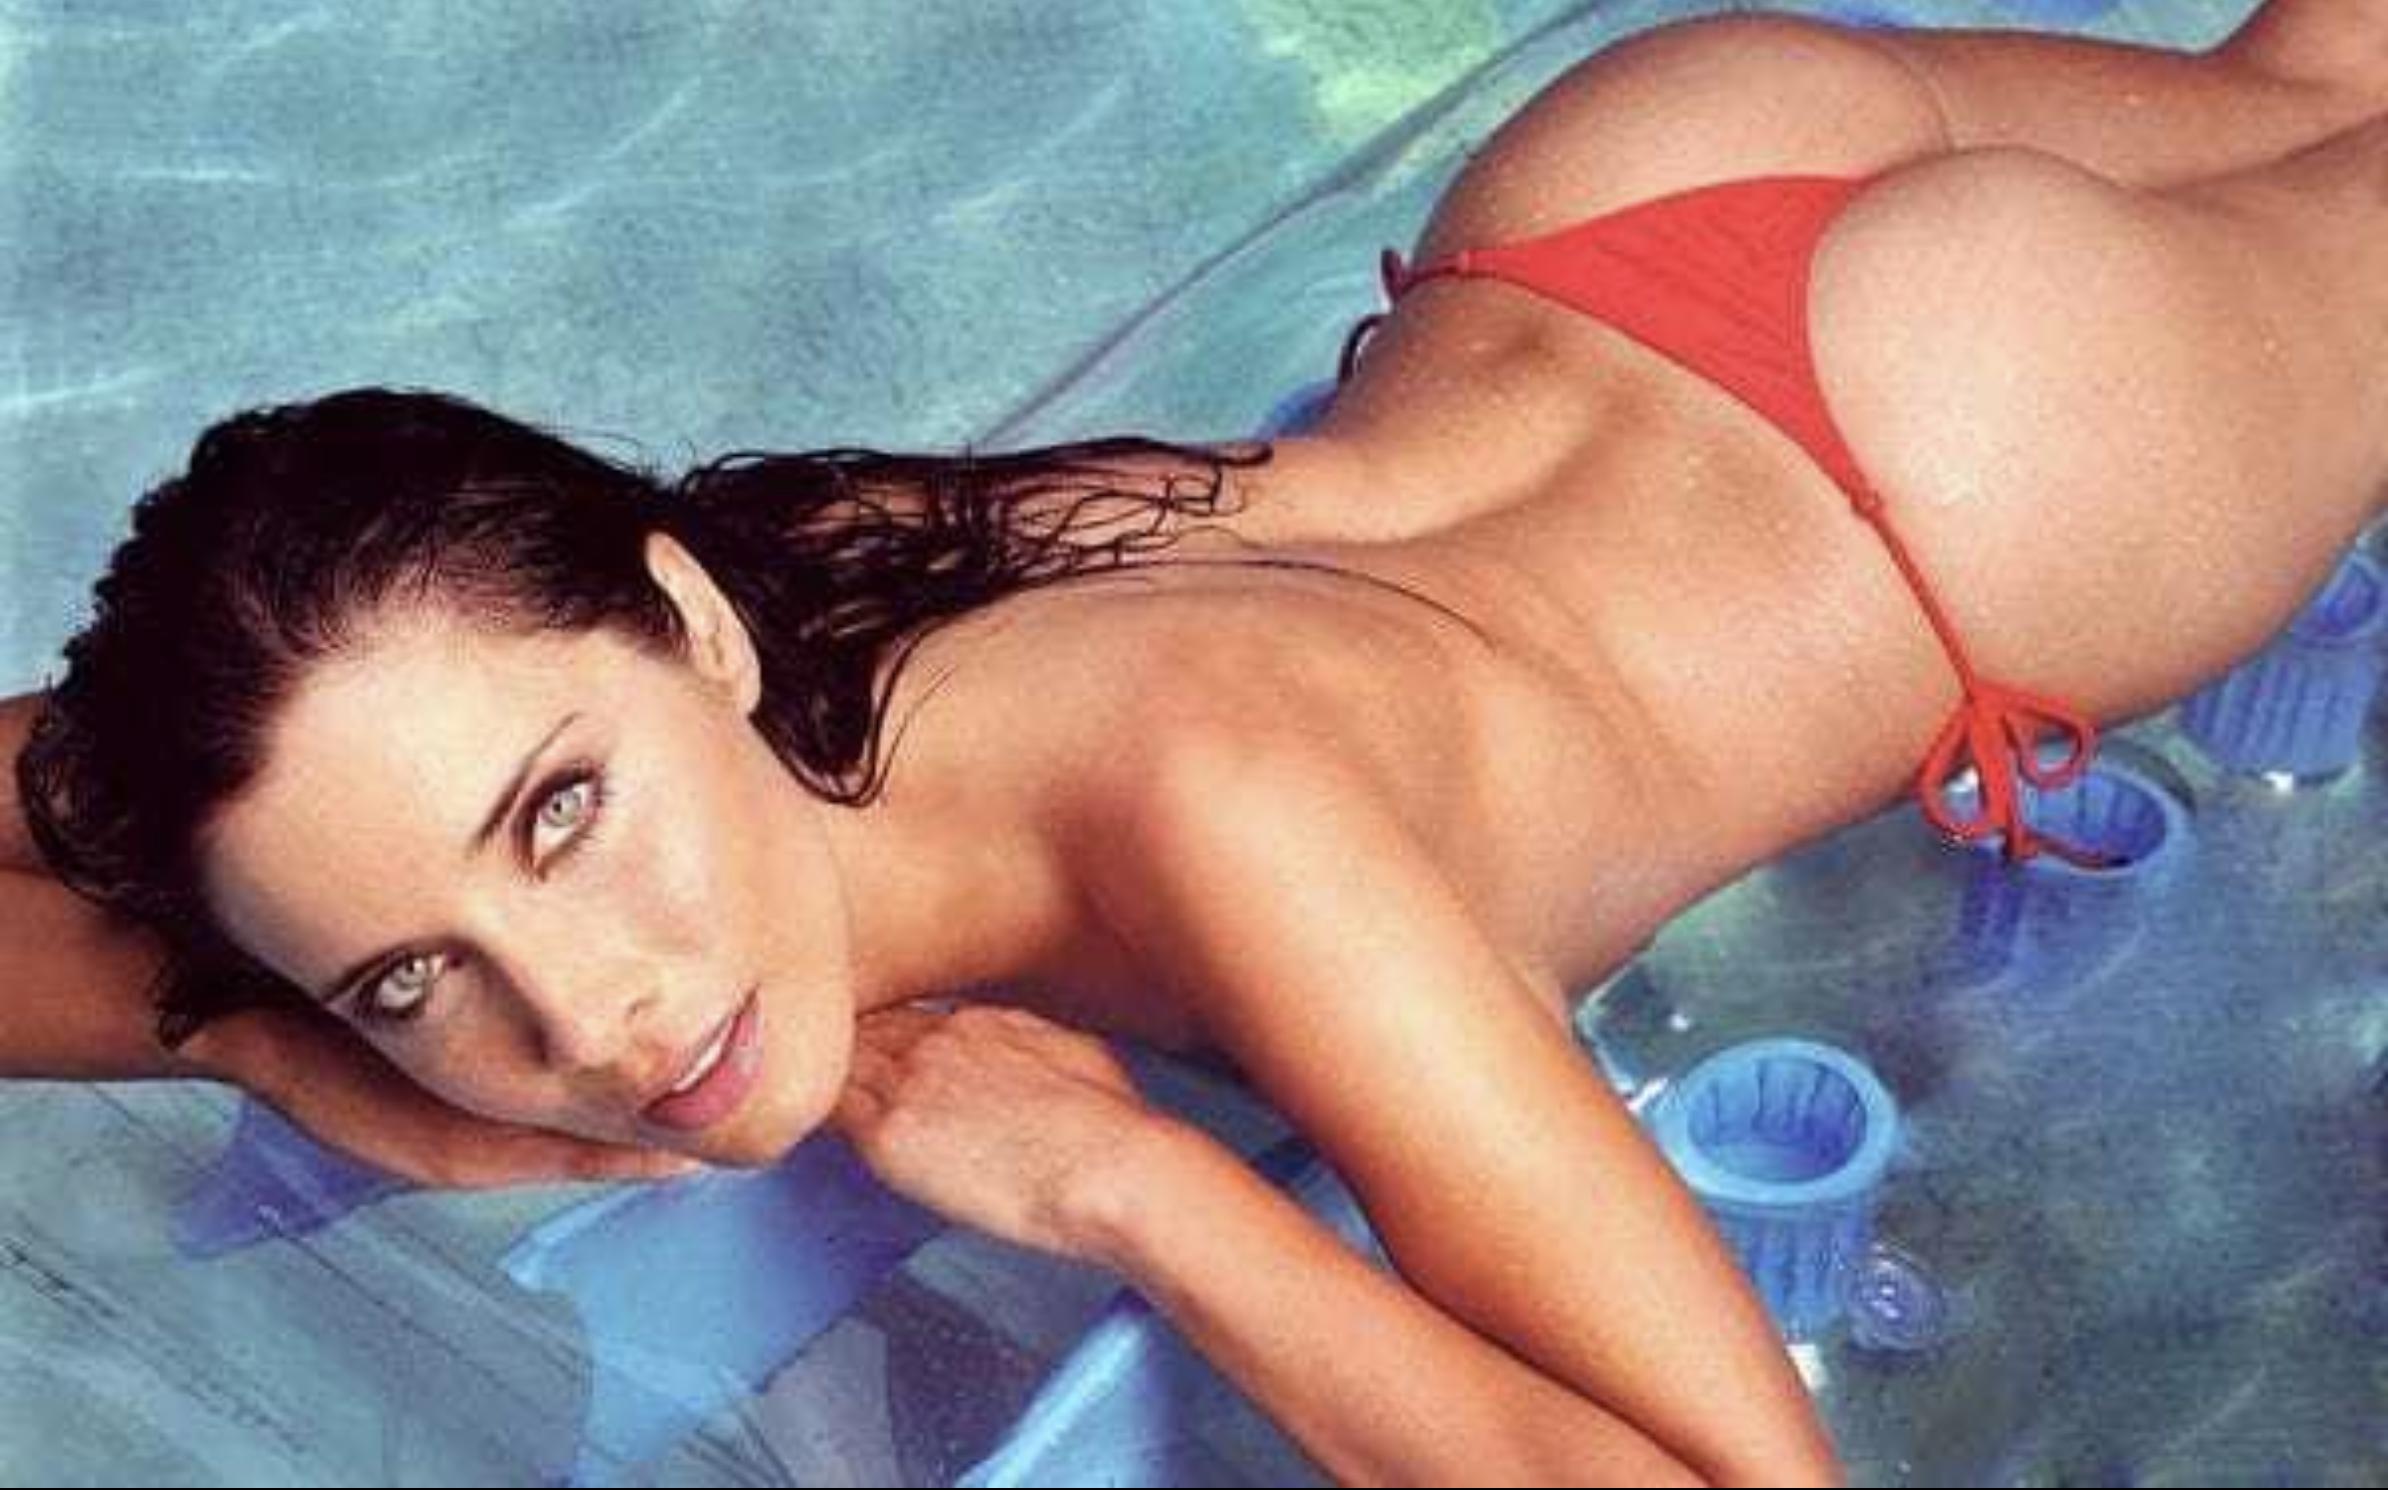 Пилар Рубио — испанская актриса, телеведущая и супруга новичка «ПСЖ» Серхио Рамоса! Пилар 43, но она в прекрасной форме